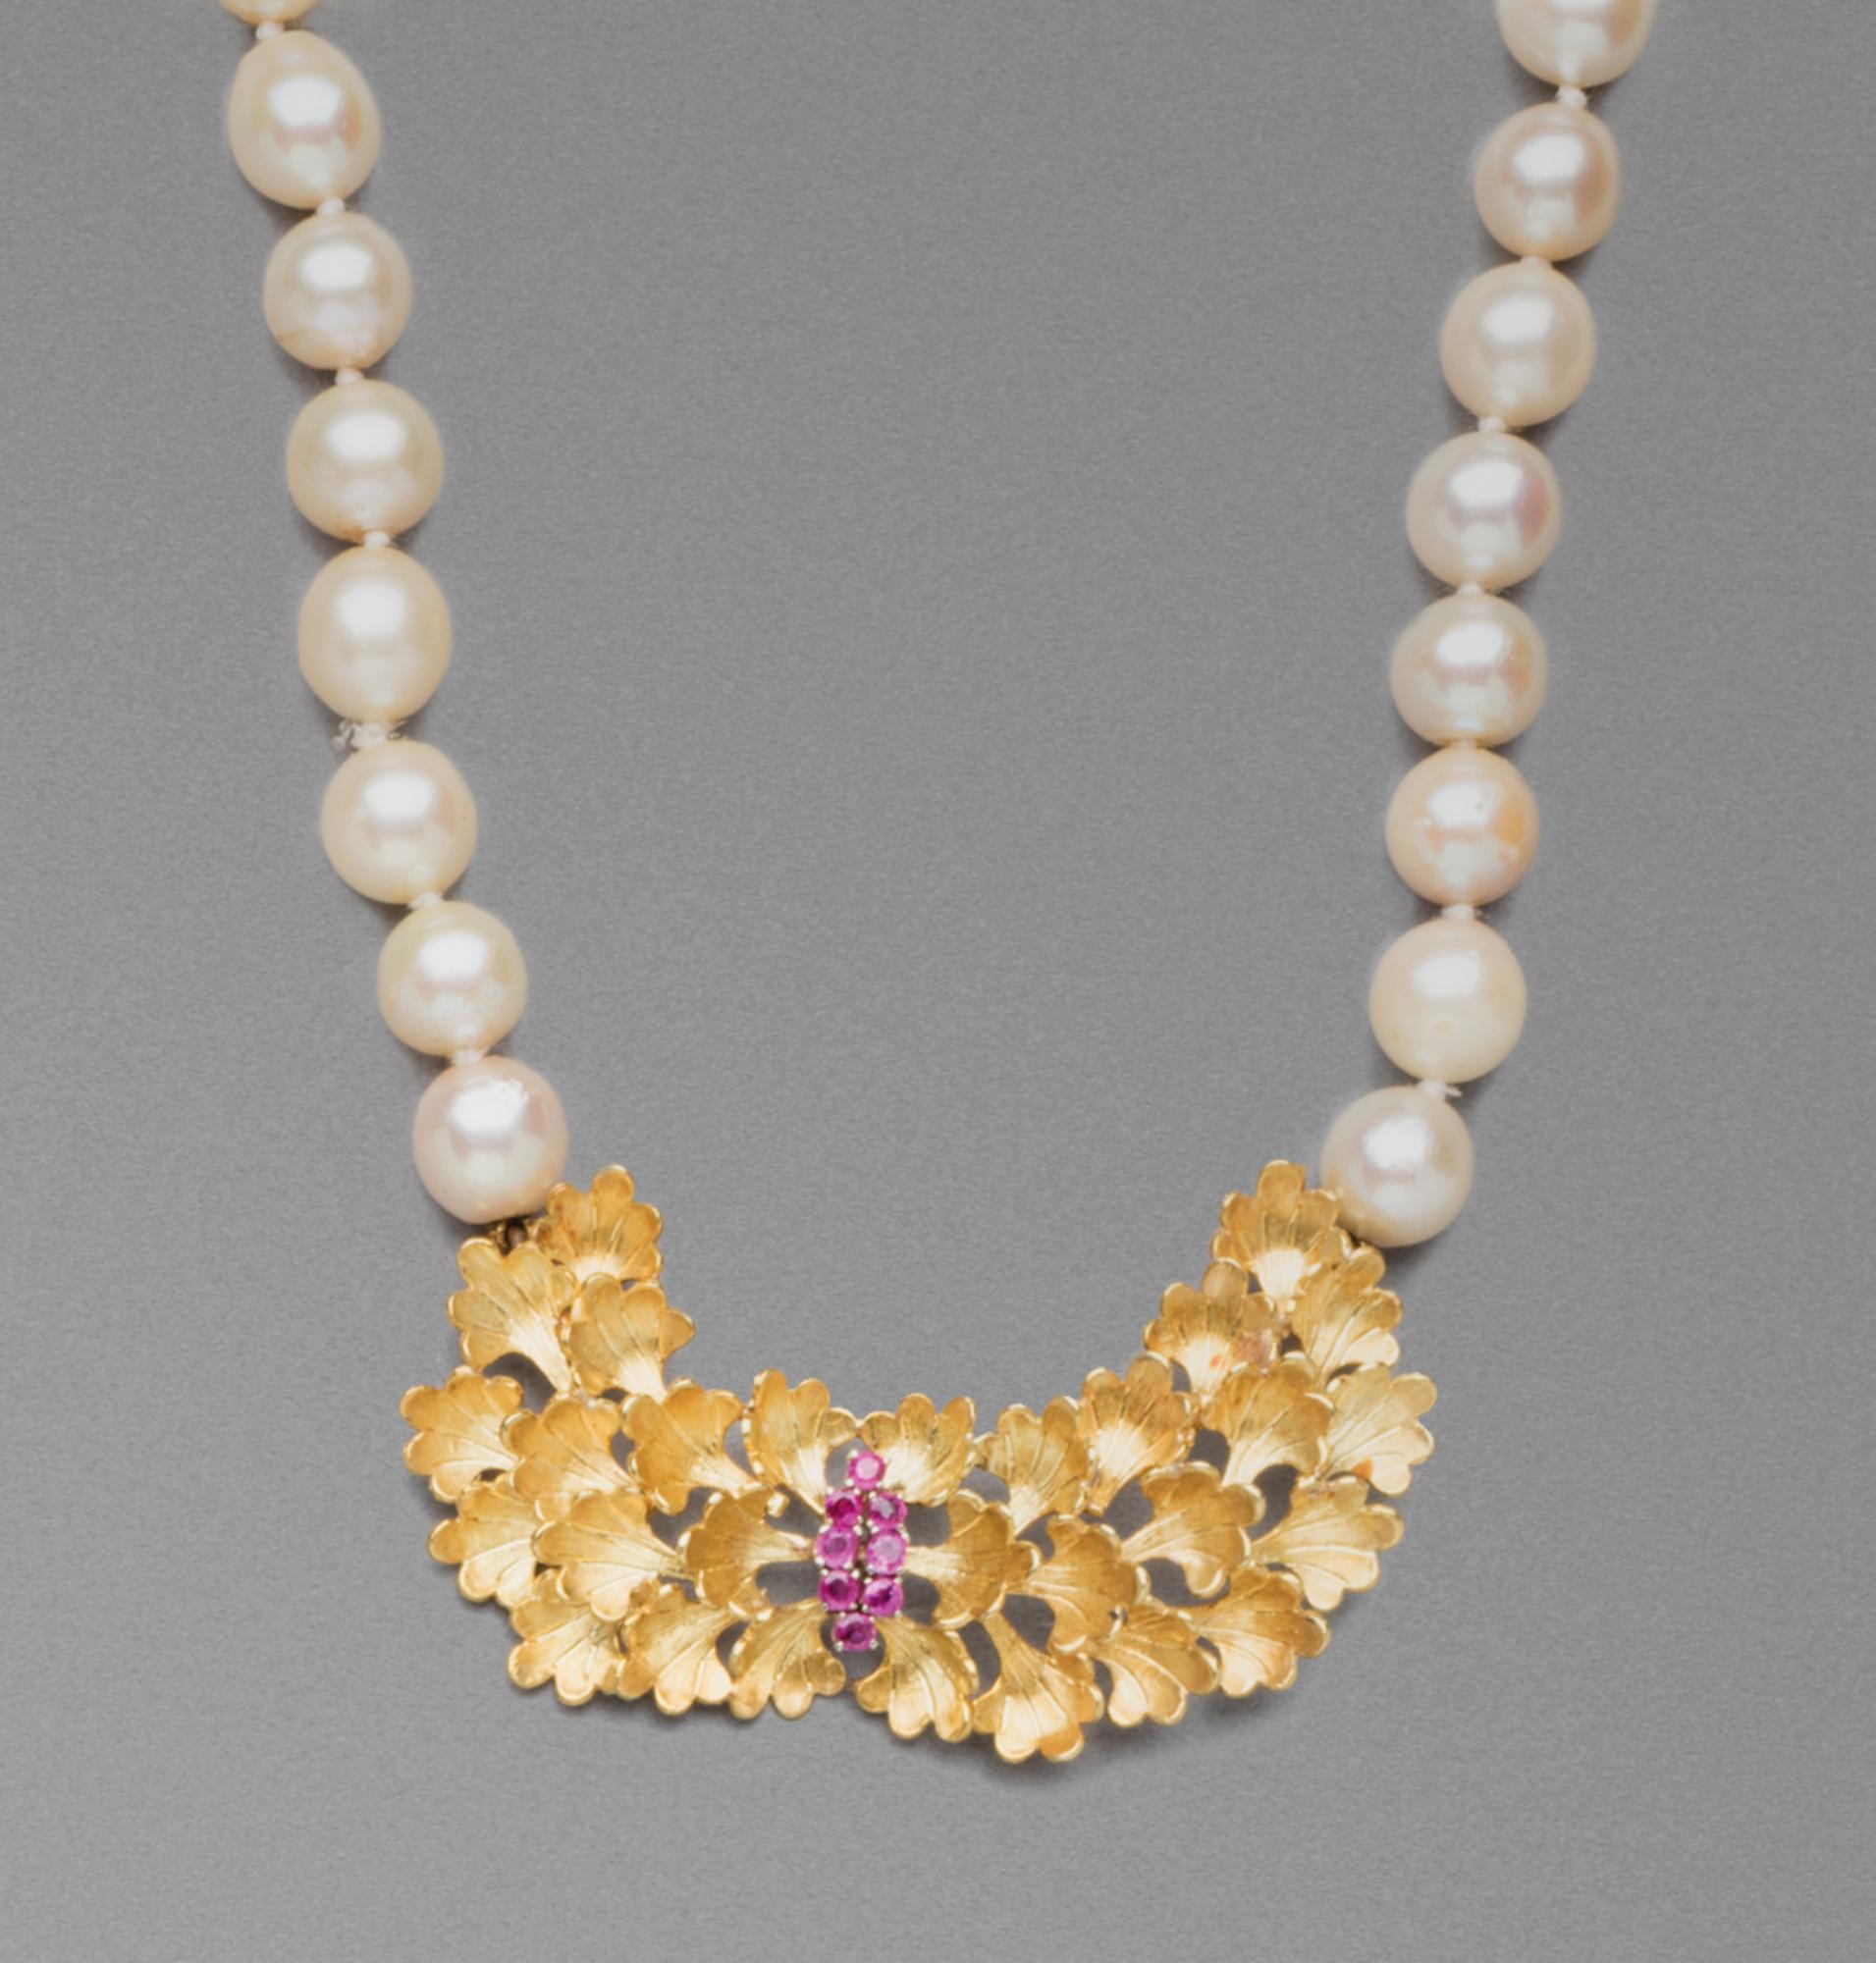 in oro, rubini e perle